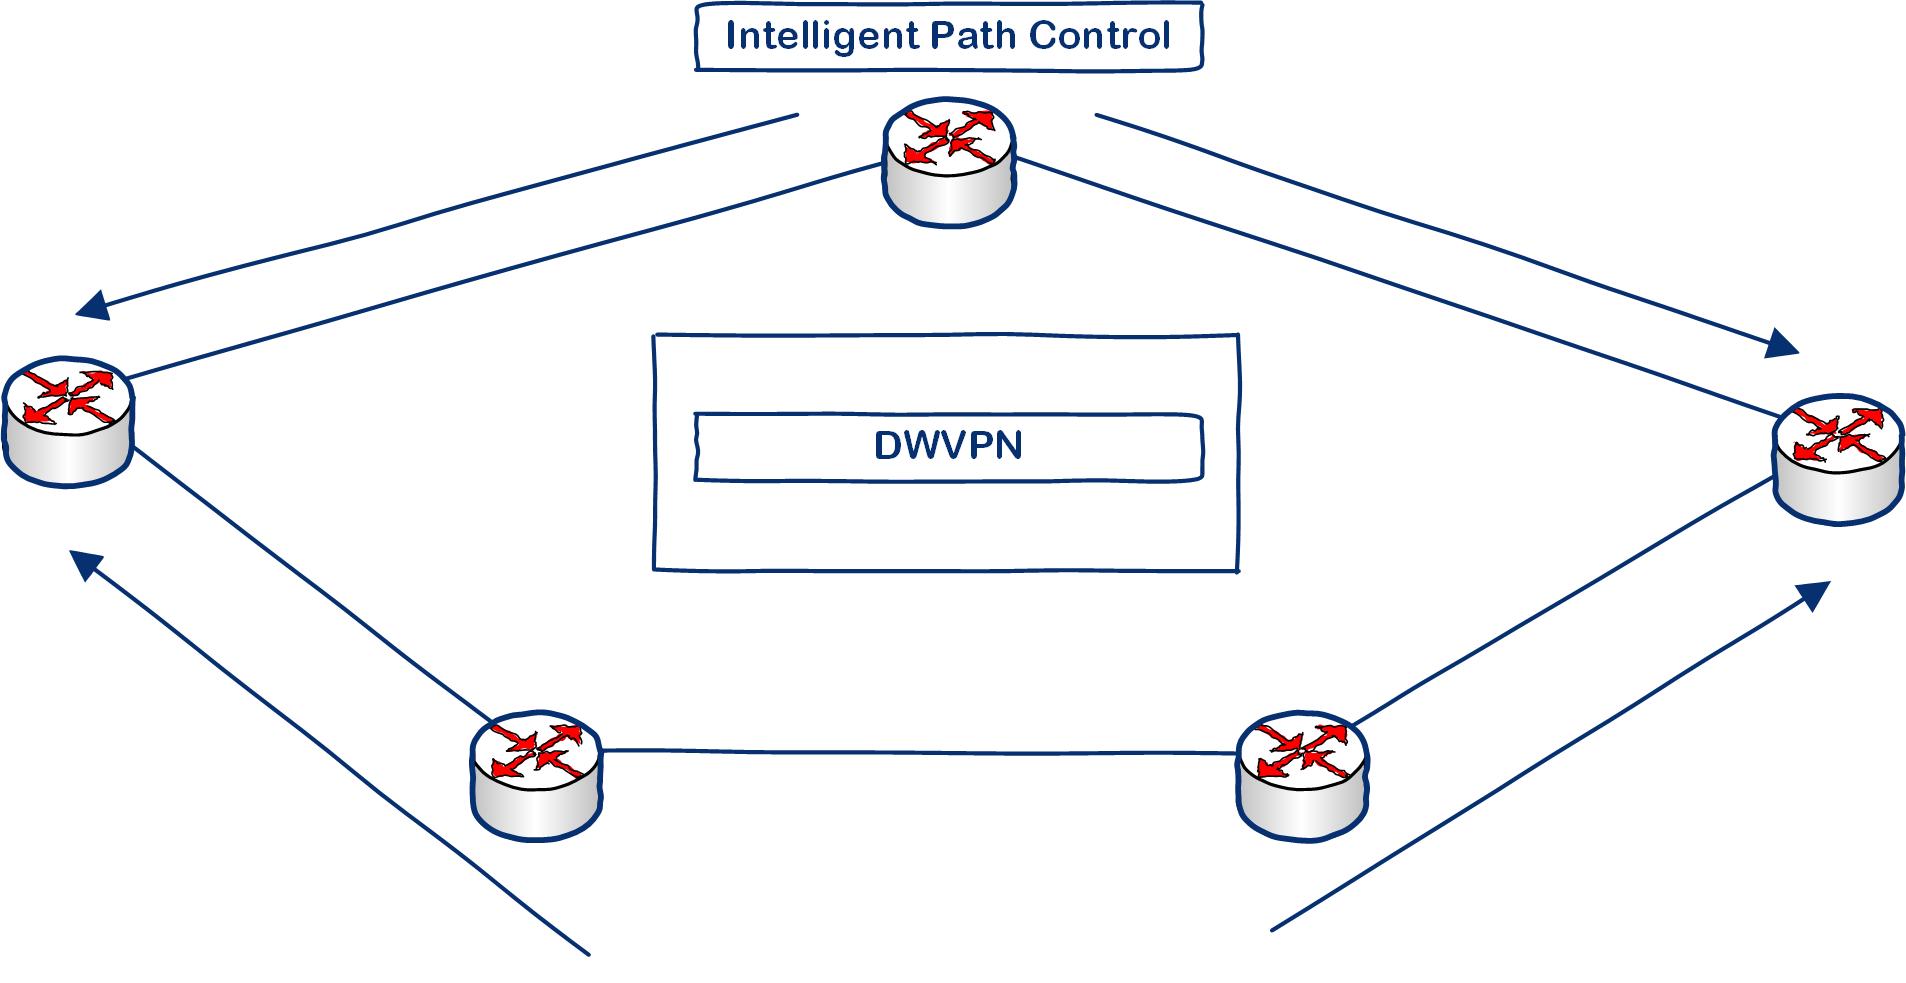 SD-WAN Intelligent Path Control